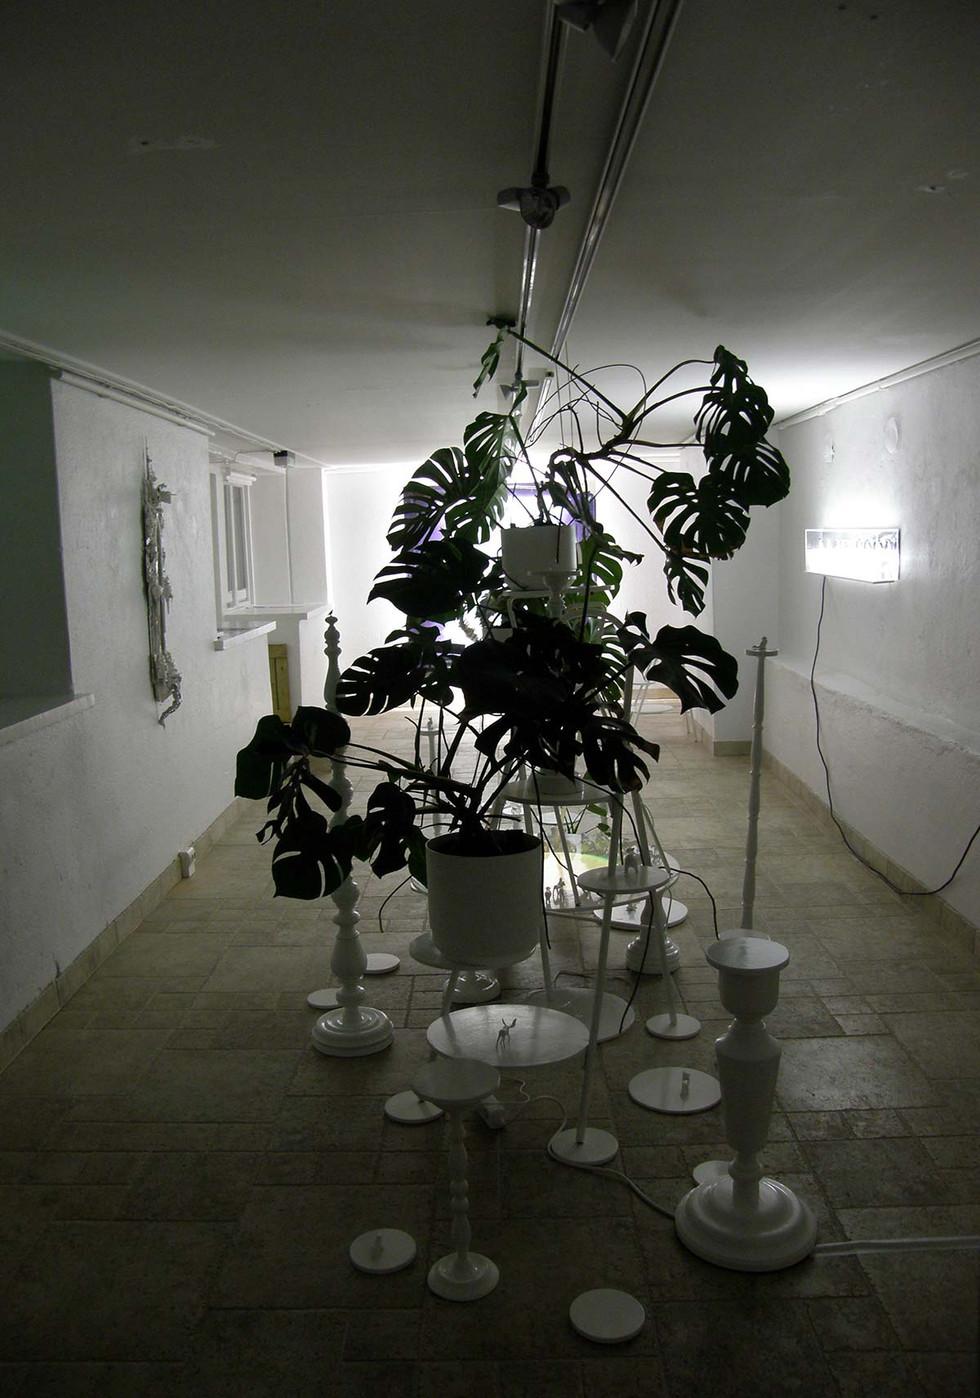 Animal-Planet-näyttely-Galleria-Voima-K